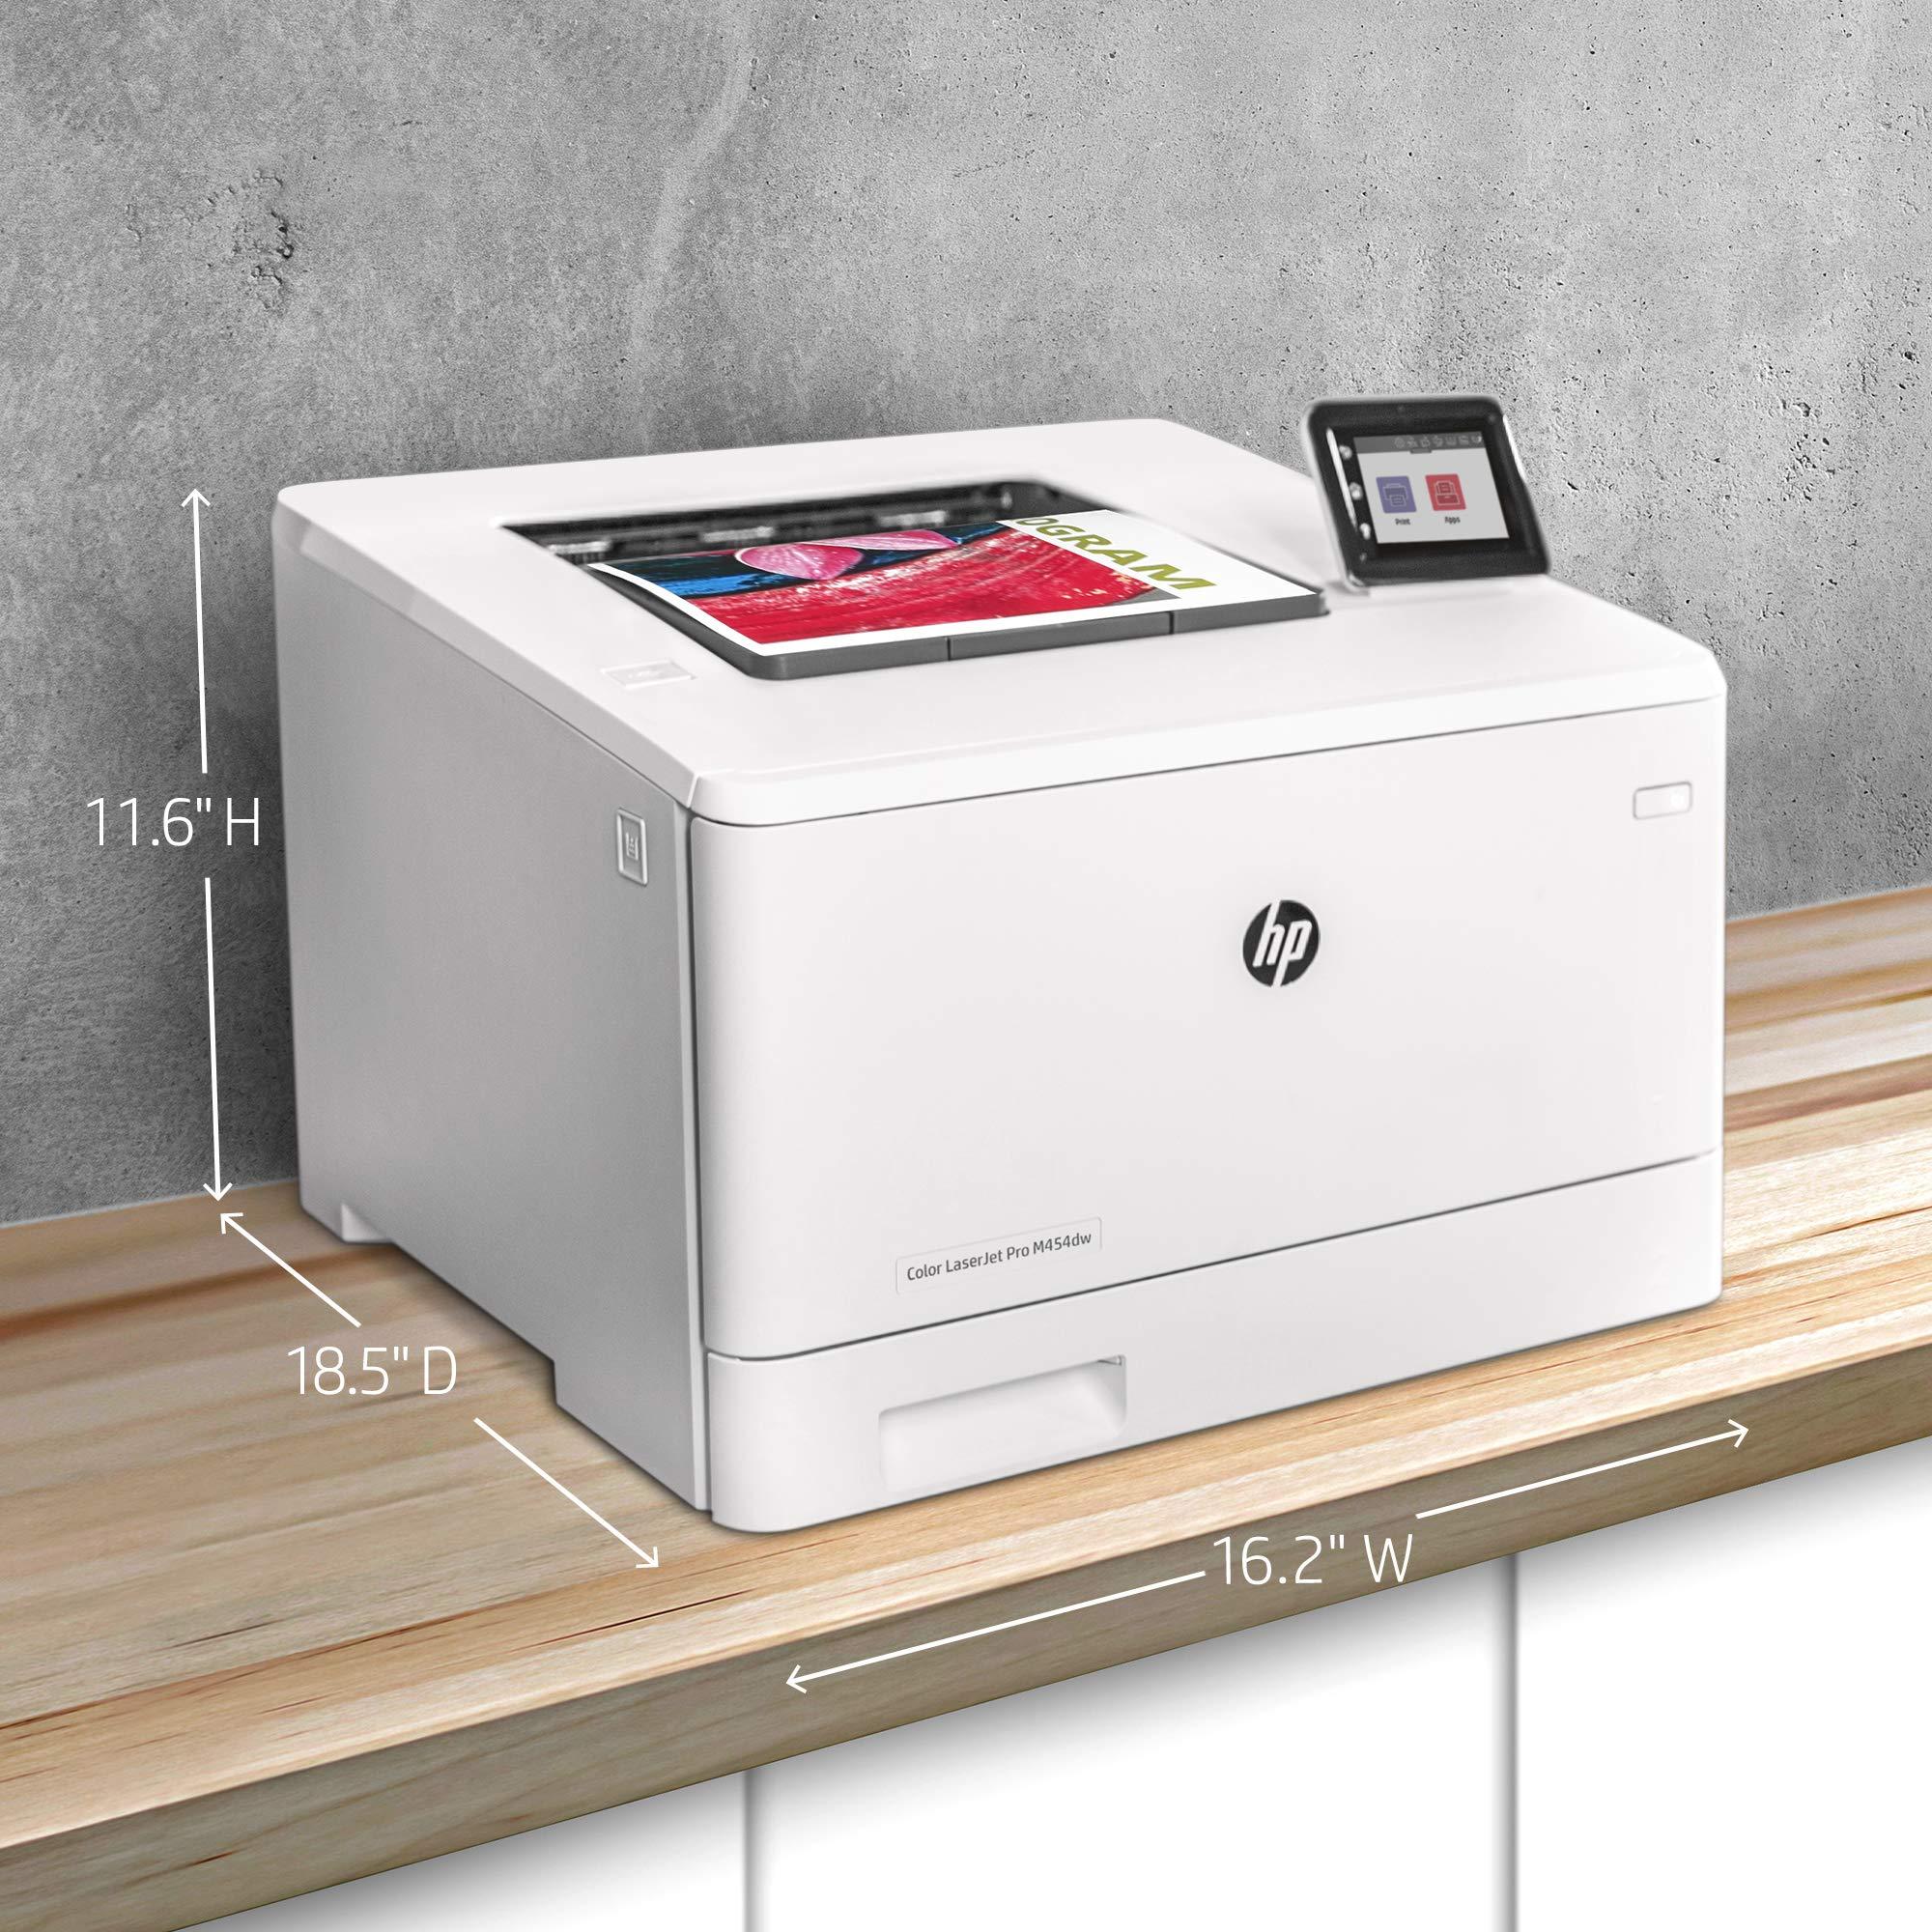 HP Color LaserJet Pro M454dw Printer (W1Y45A) by HP (Image #13)